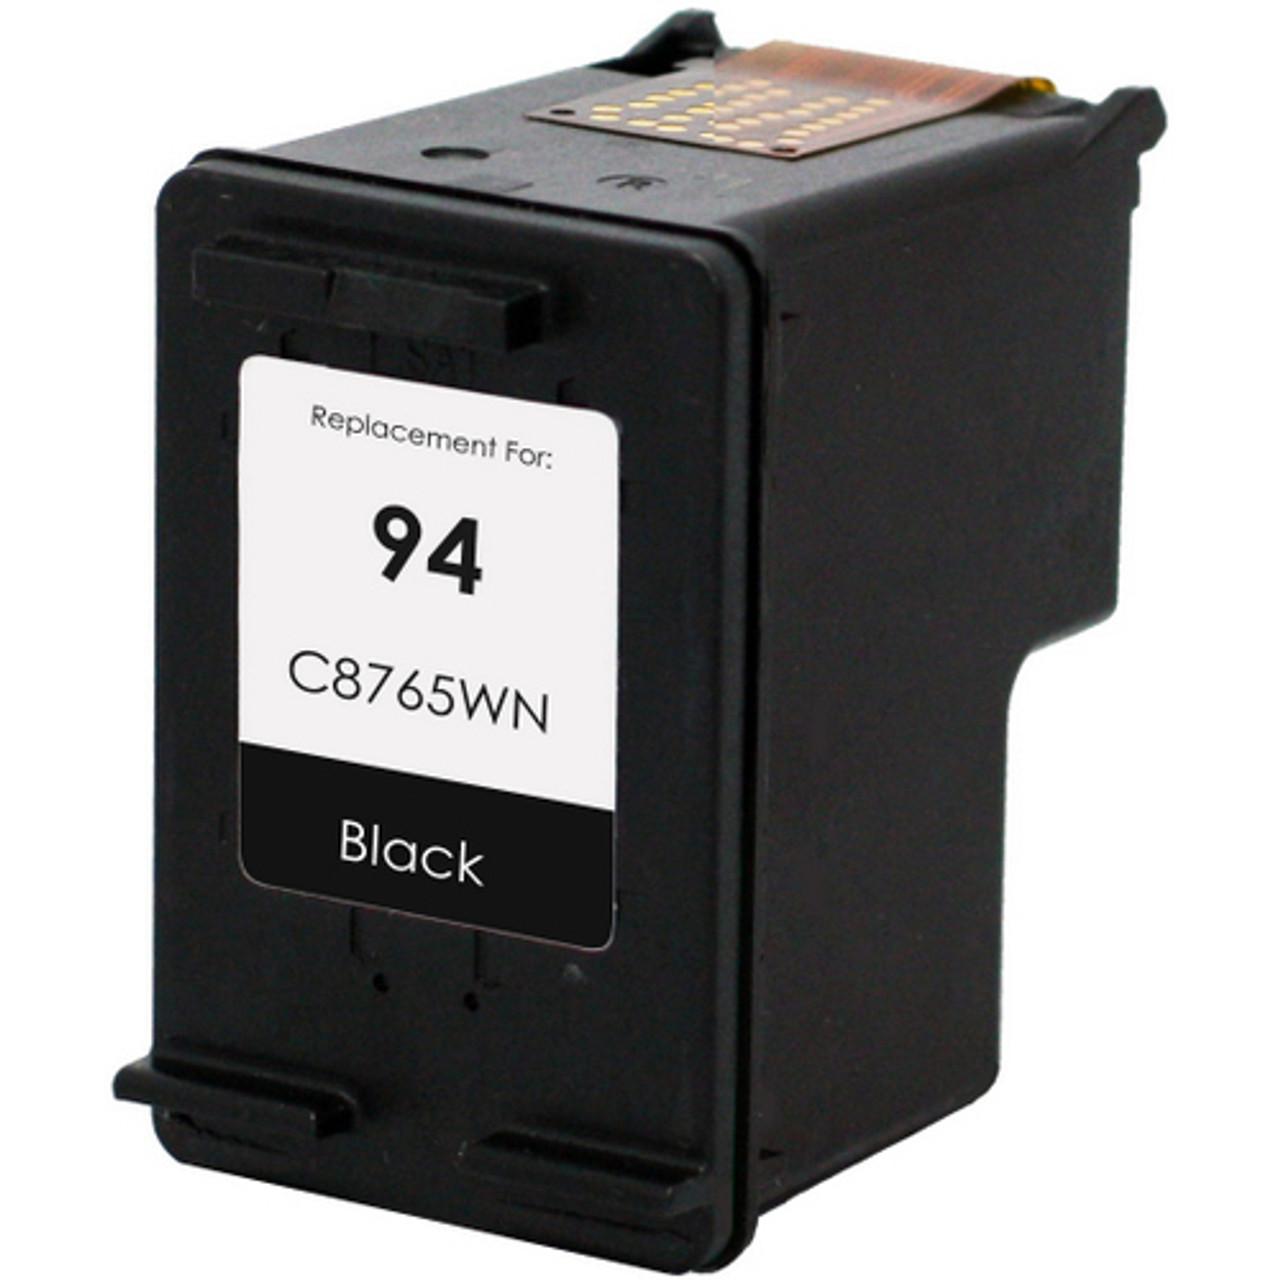 Remanufactured C8765WN C8766WN Ink Cartridge For HP 94 95 Deskjet 5740 6520